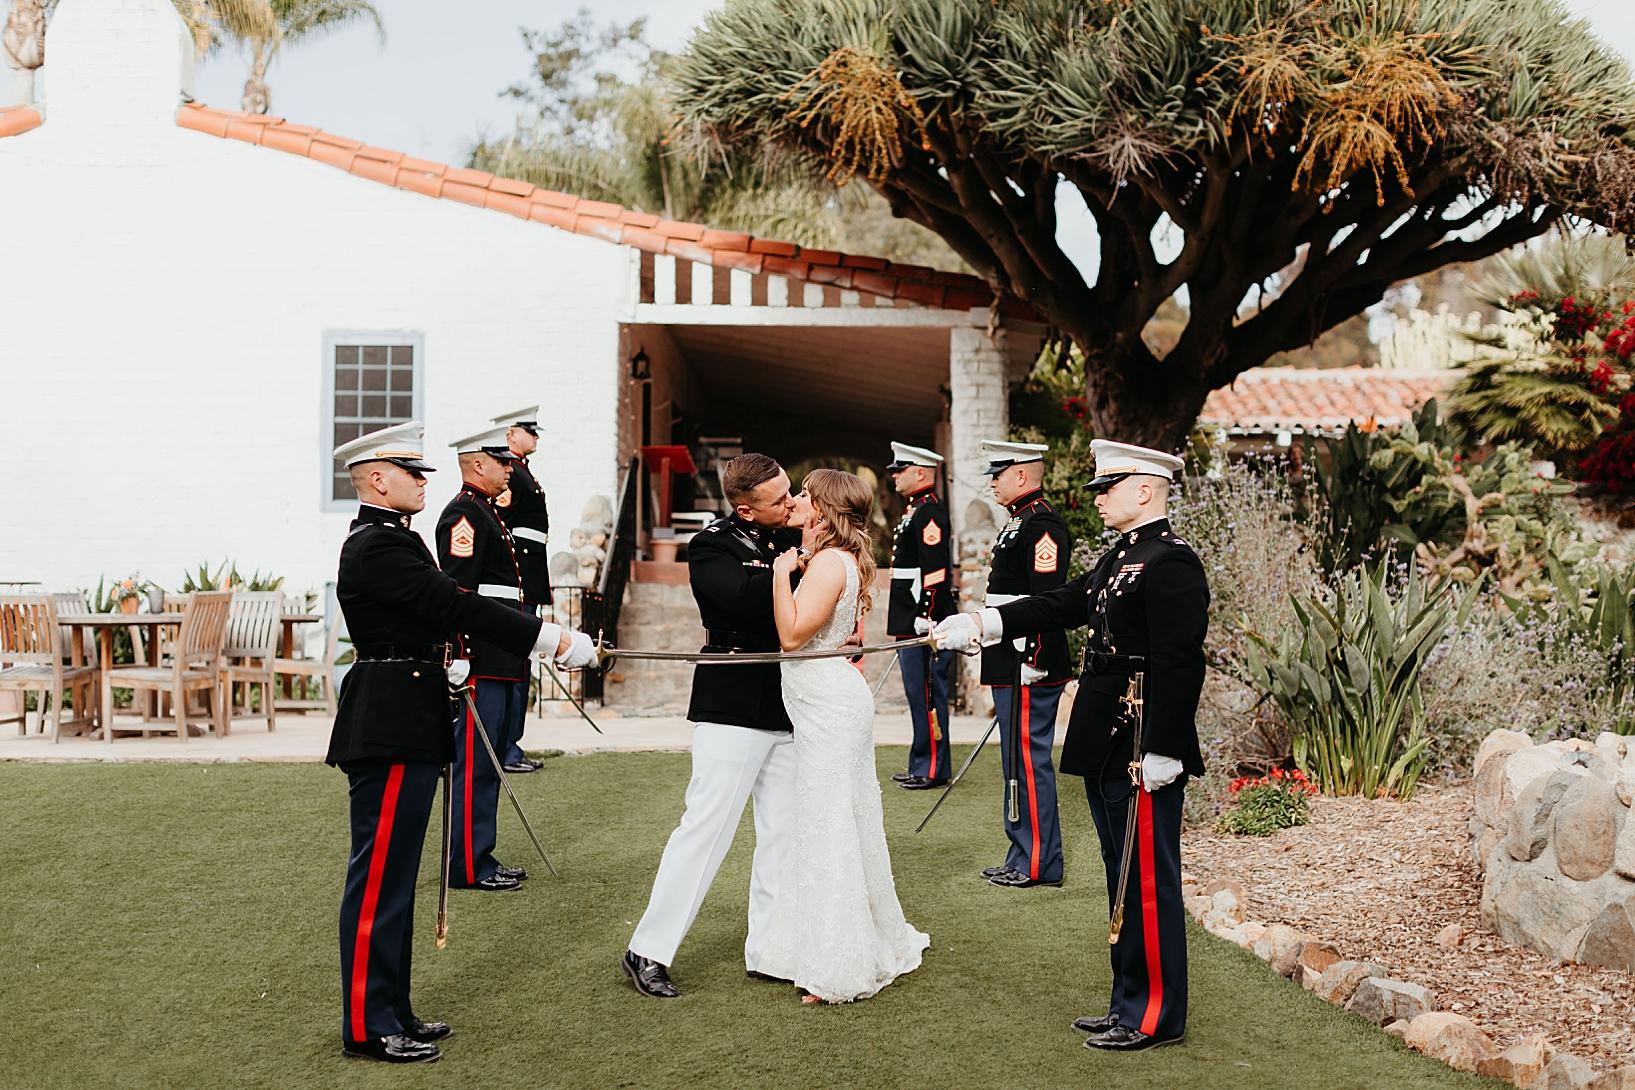 Leo-Carrillo-Ranch-Wedding-75.jpg